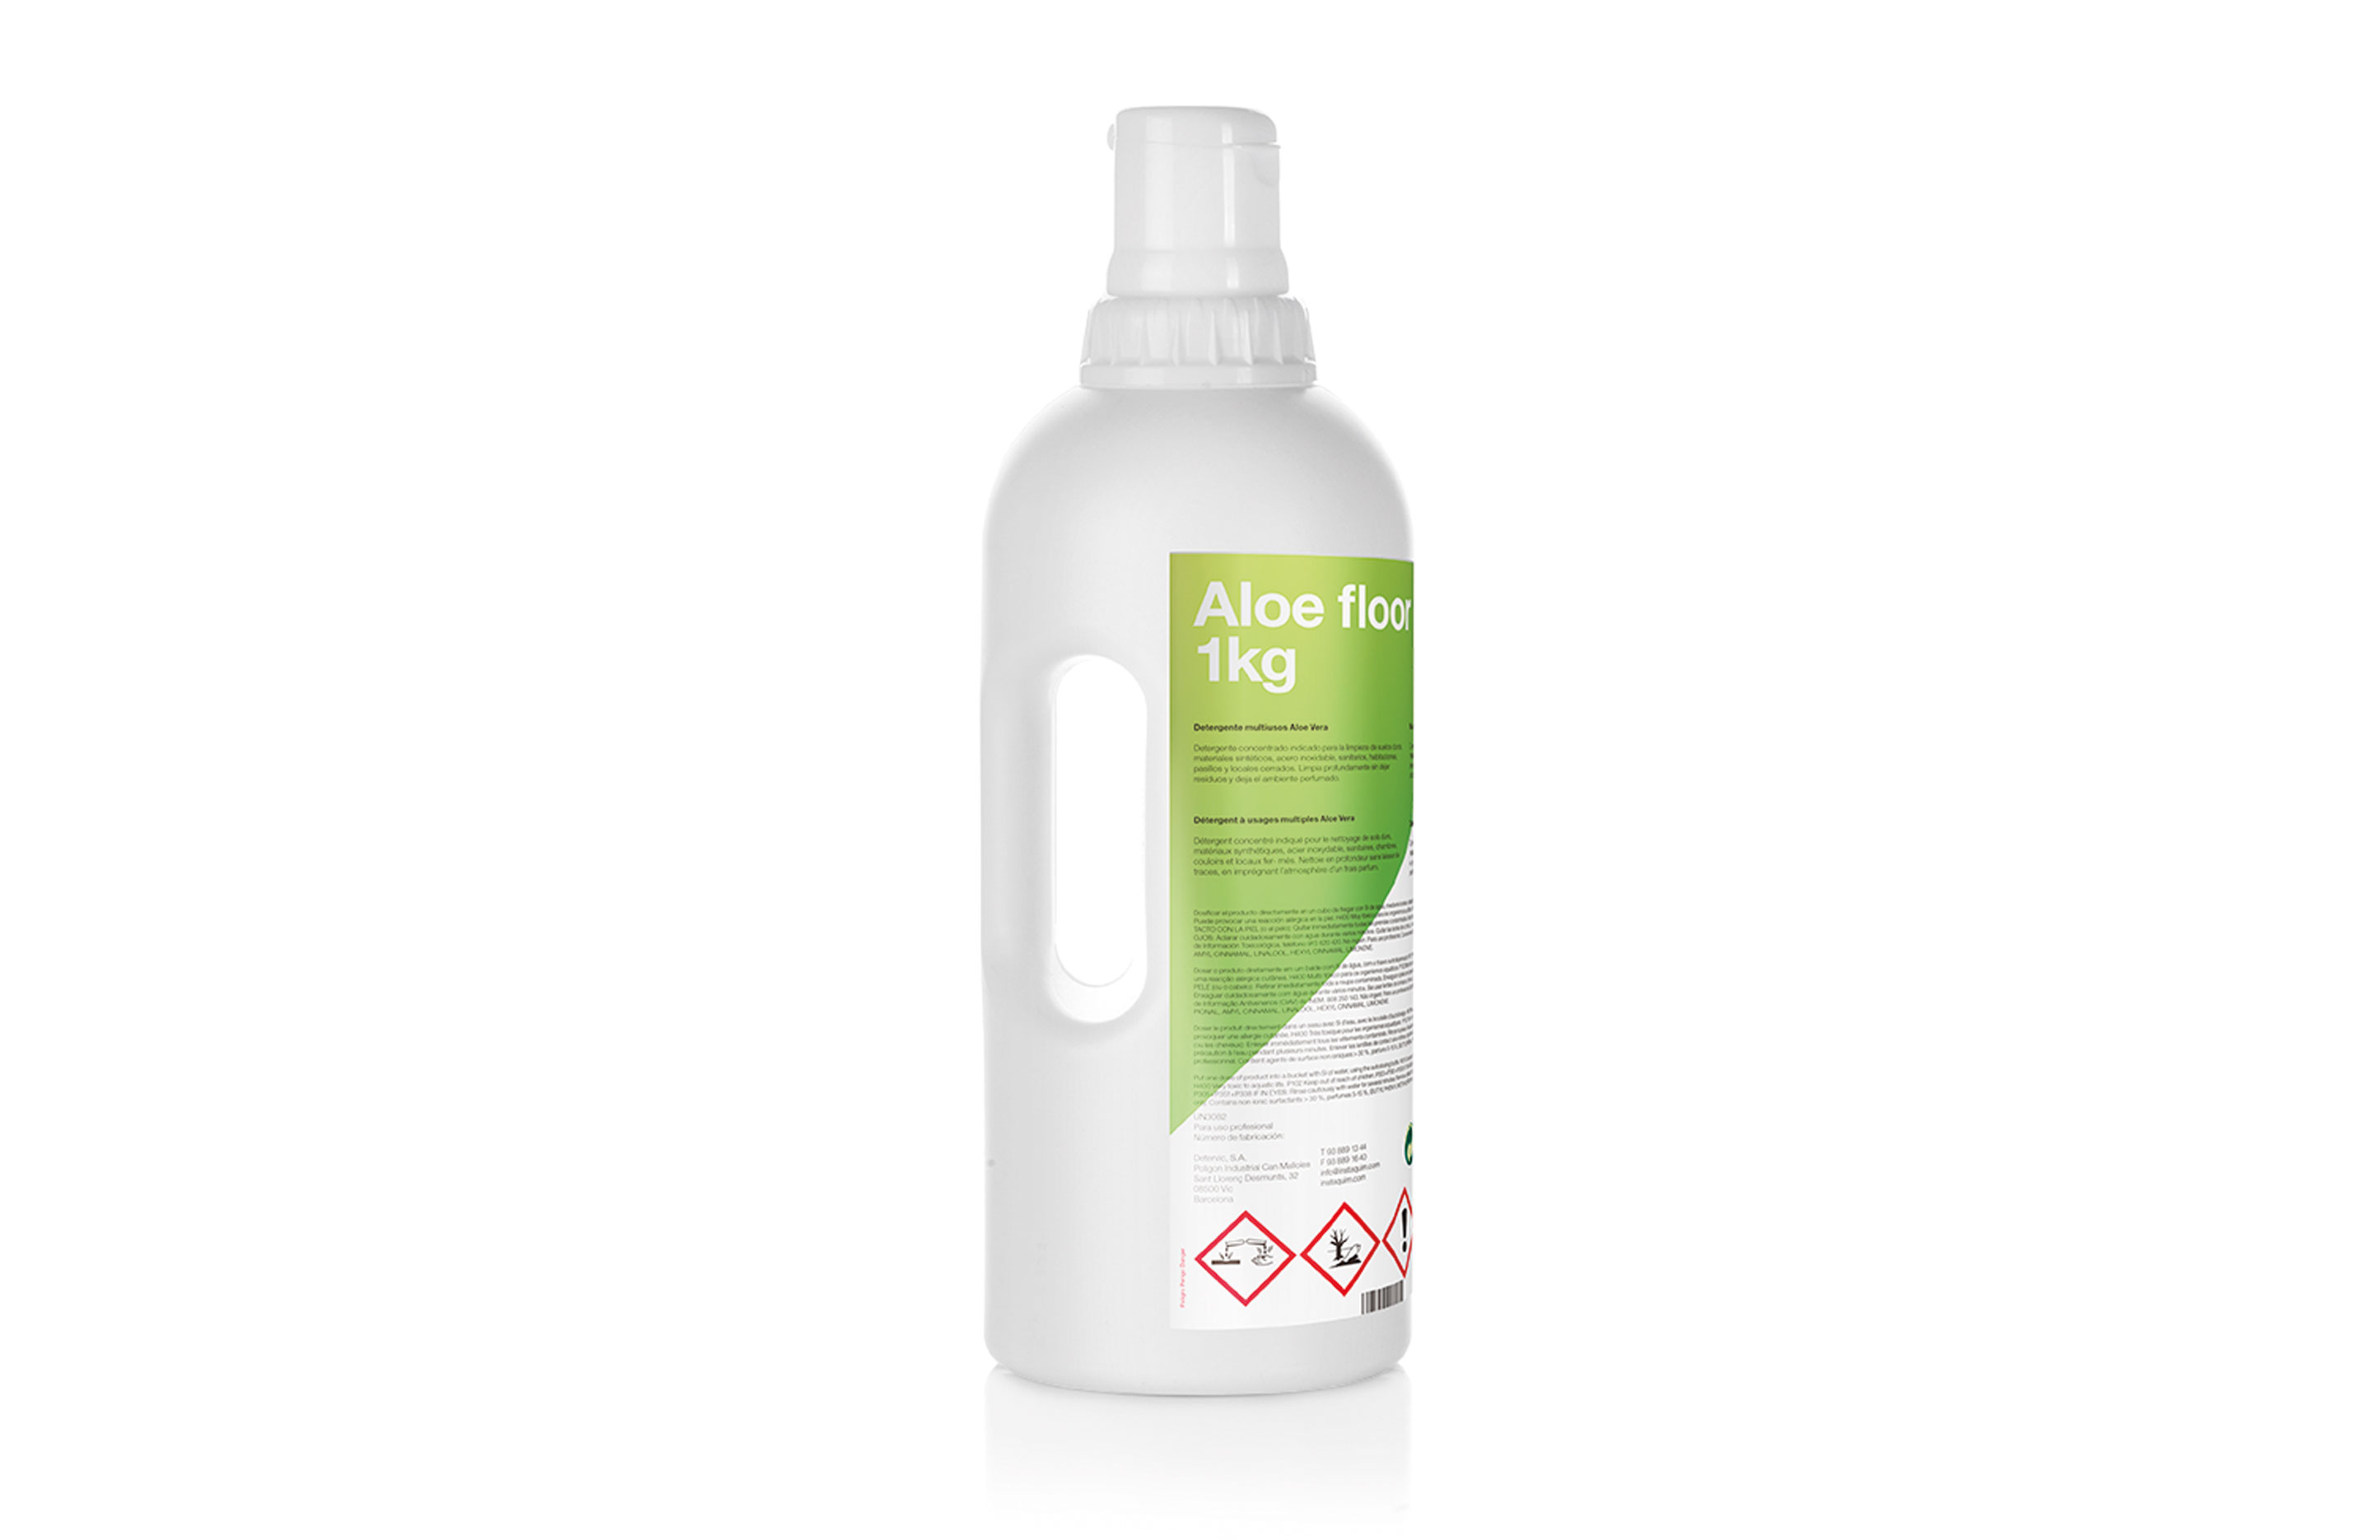 Aloe Floor, detergente multiusos Aloe Vera